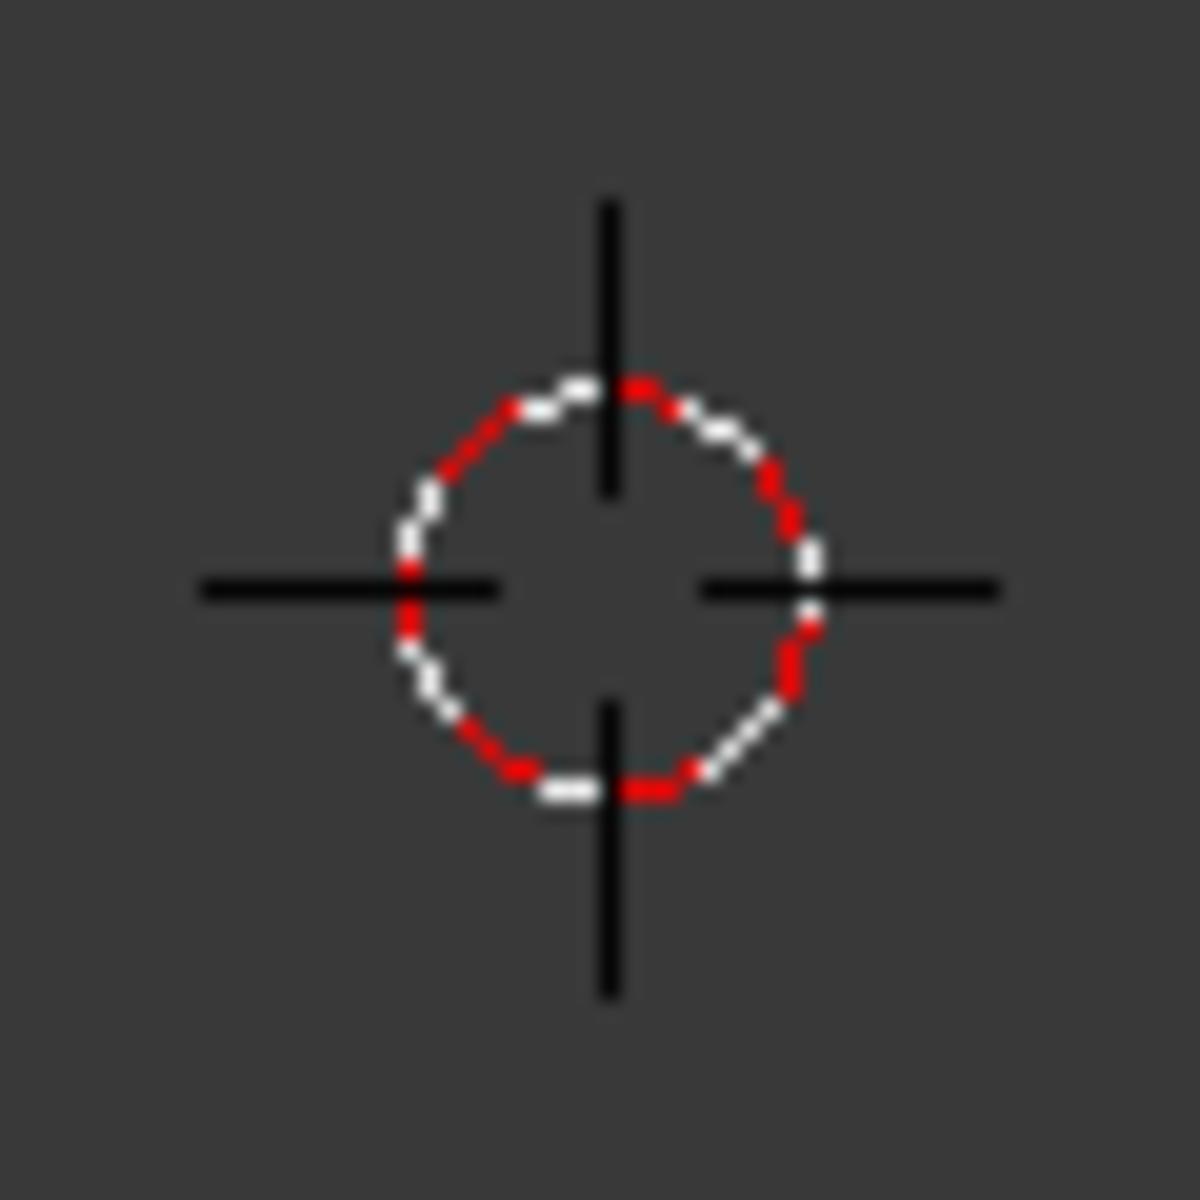 Blender's 3D cursor.